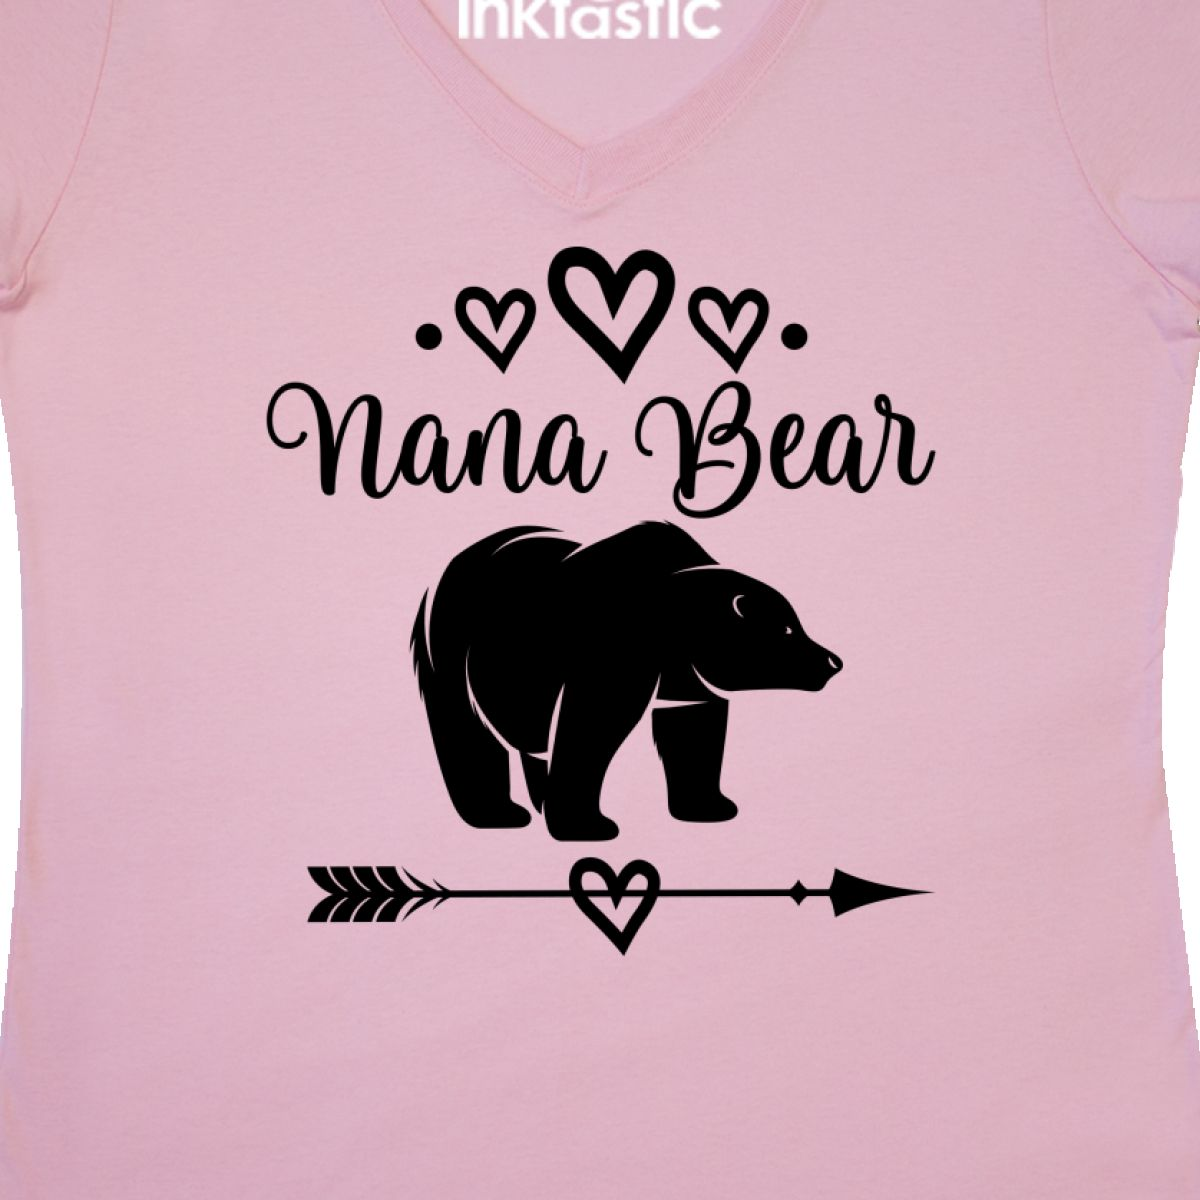 Inktastic Nana Bear Grandma Gift Women/'s V-Neck T-Shirt Clothing Tribal Present